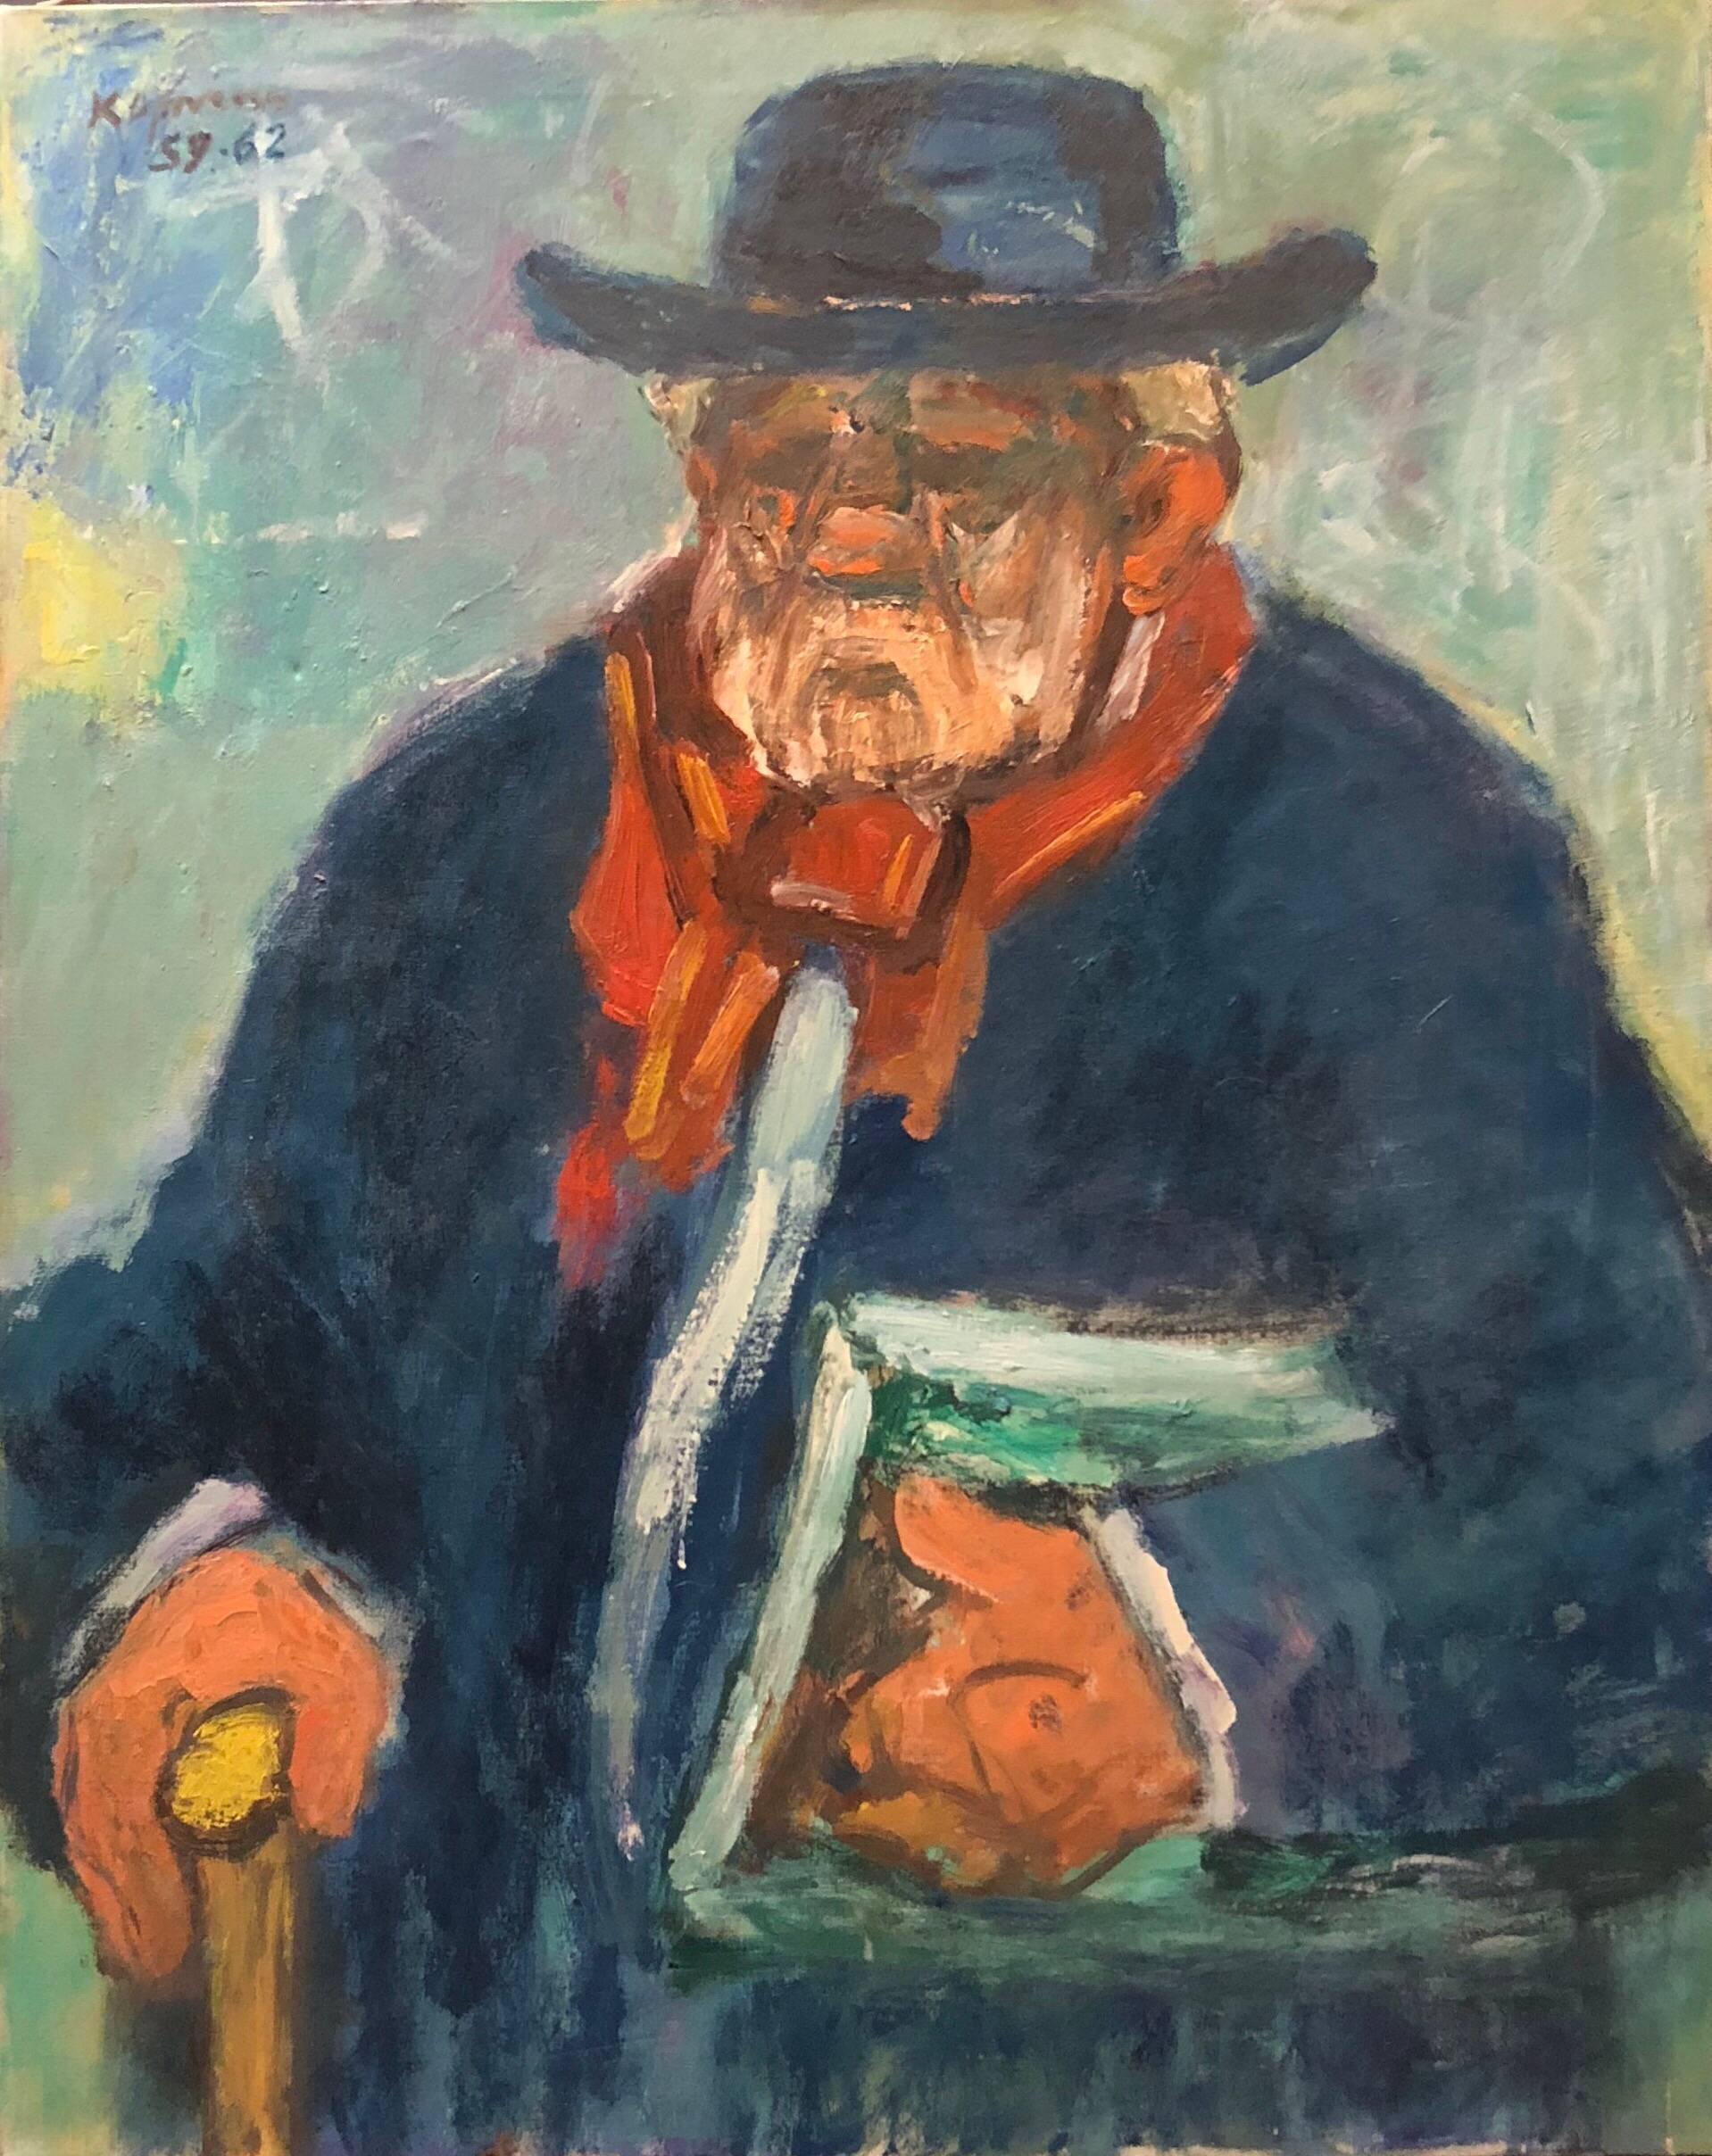 Portrait of a Gentleman, Large Modernist Oil Painting